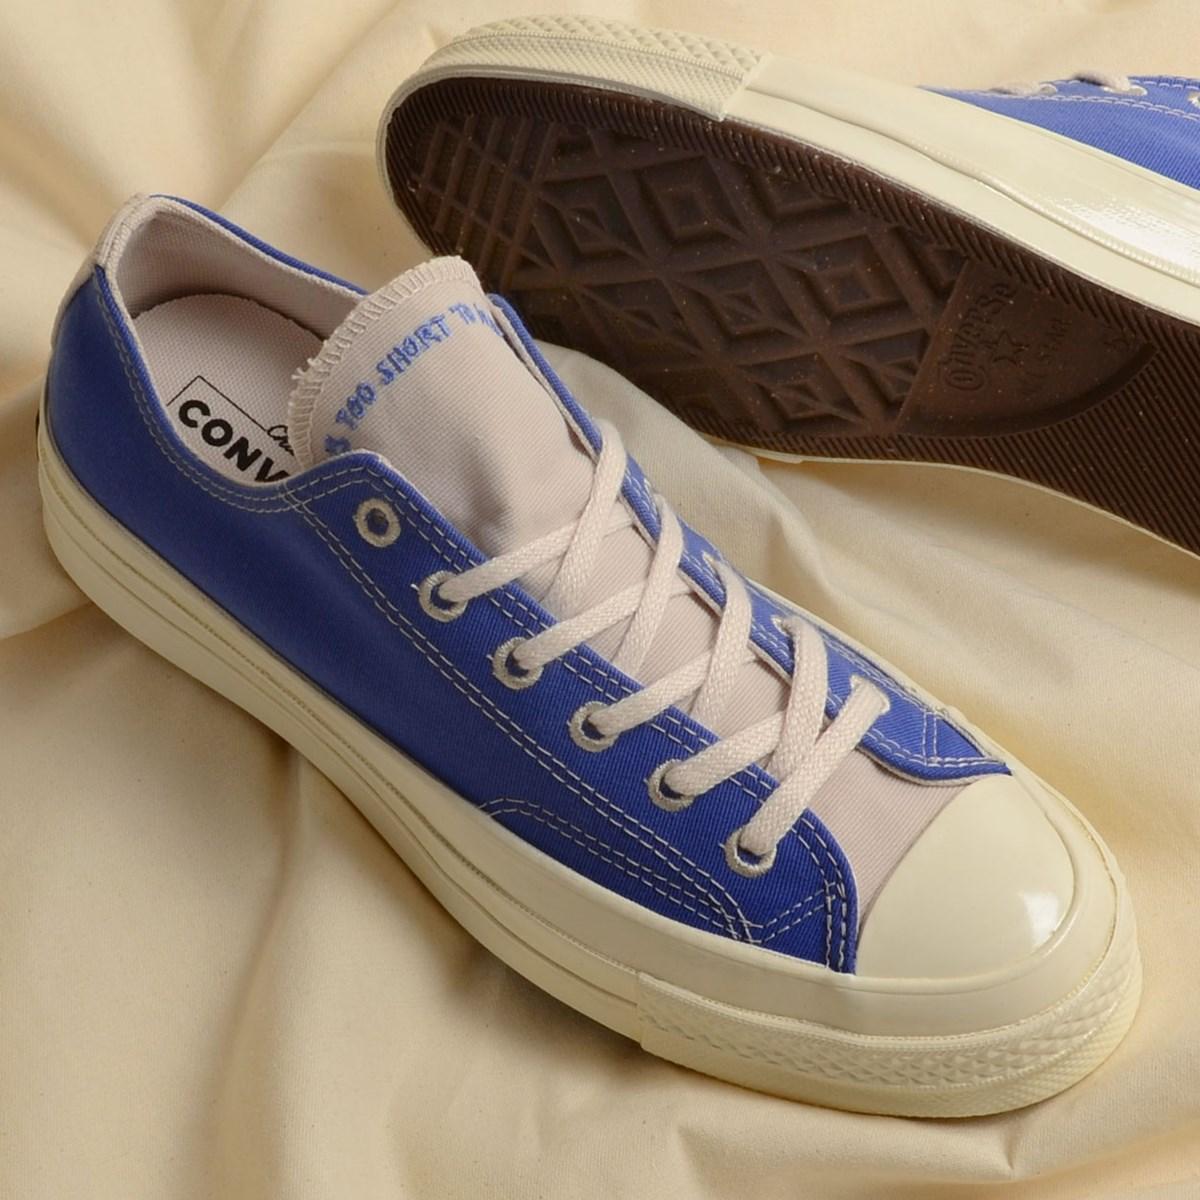 Tênis Converse Chuck 70 Renew Ox Ozone Blue 165422C